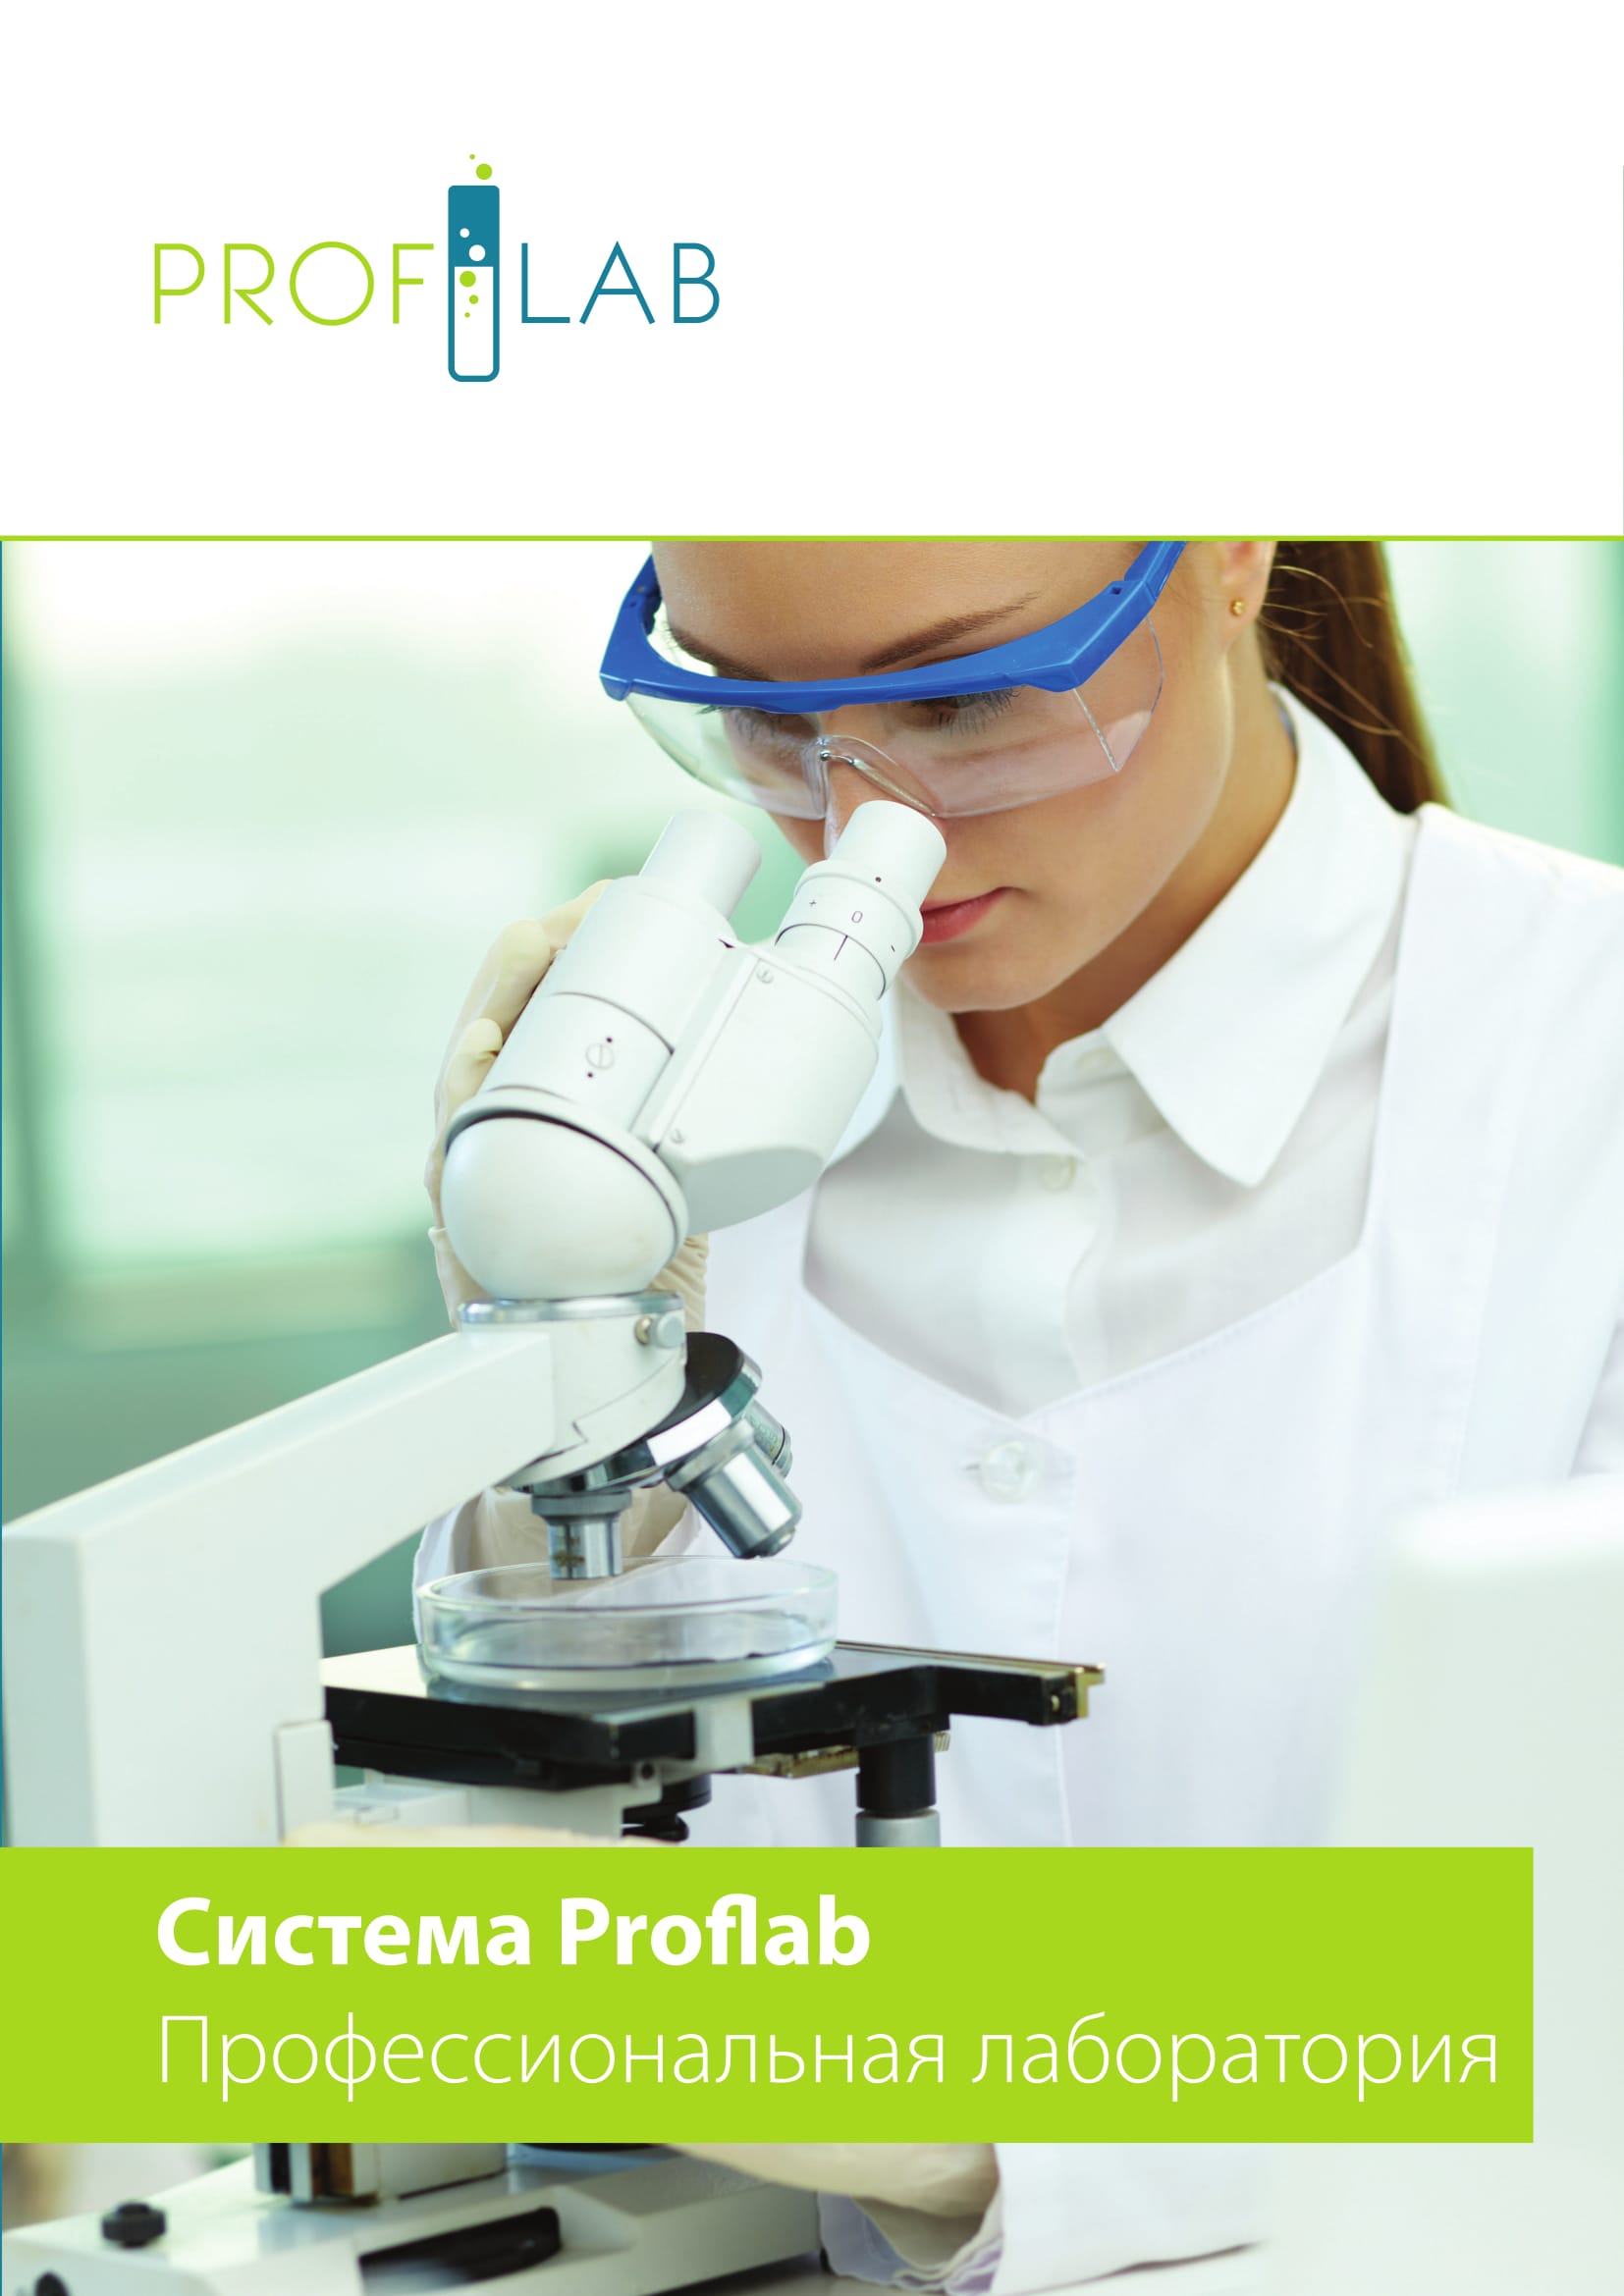 ProfLab leaflet